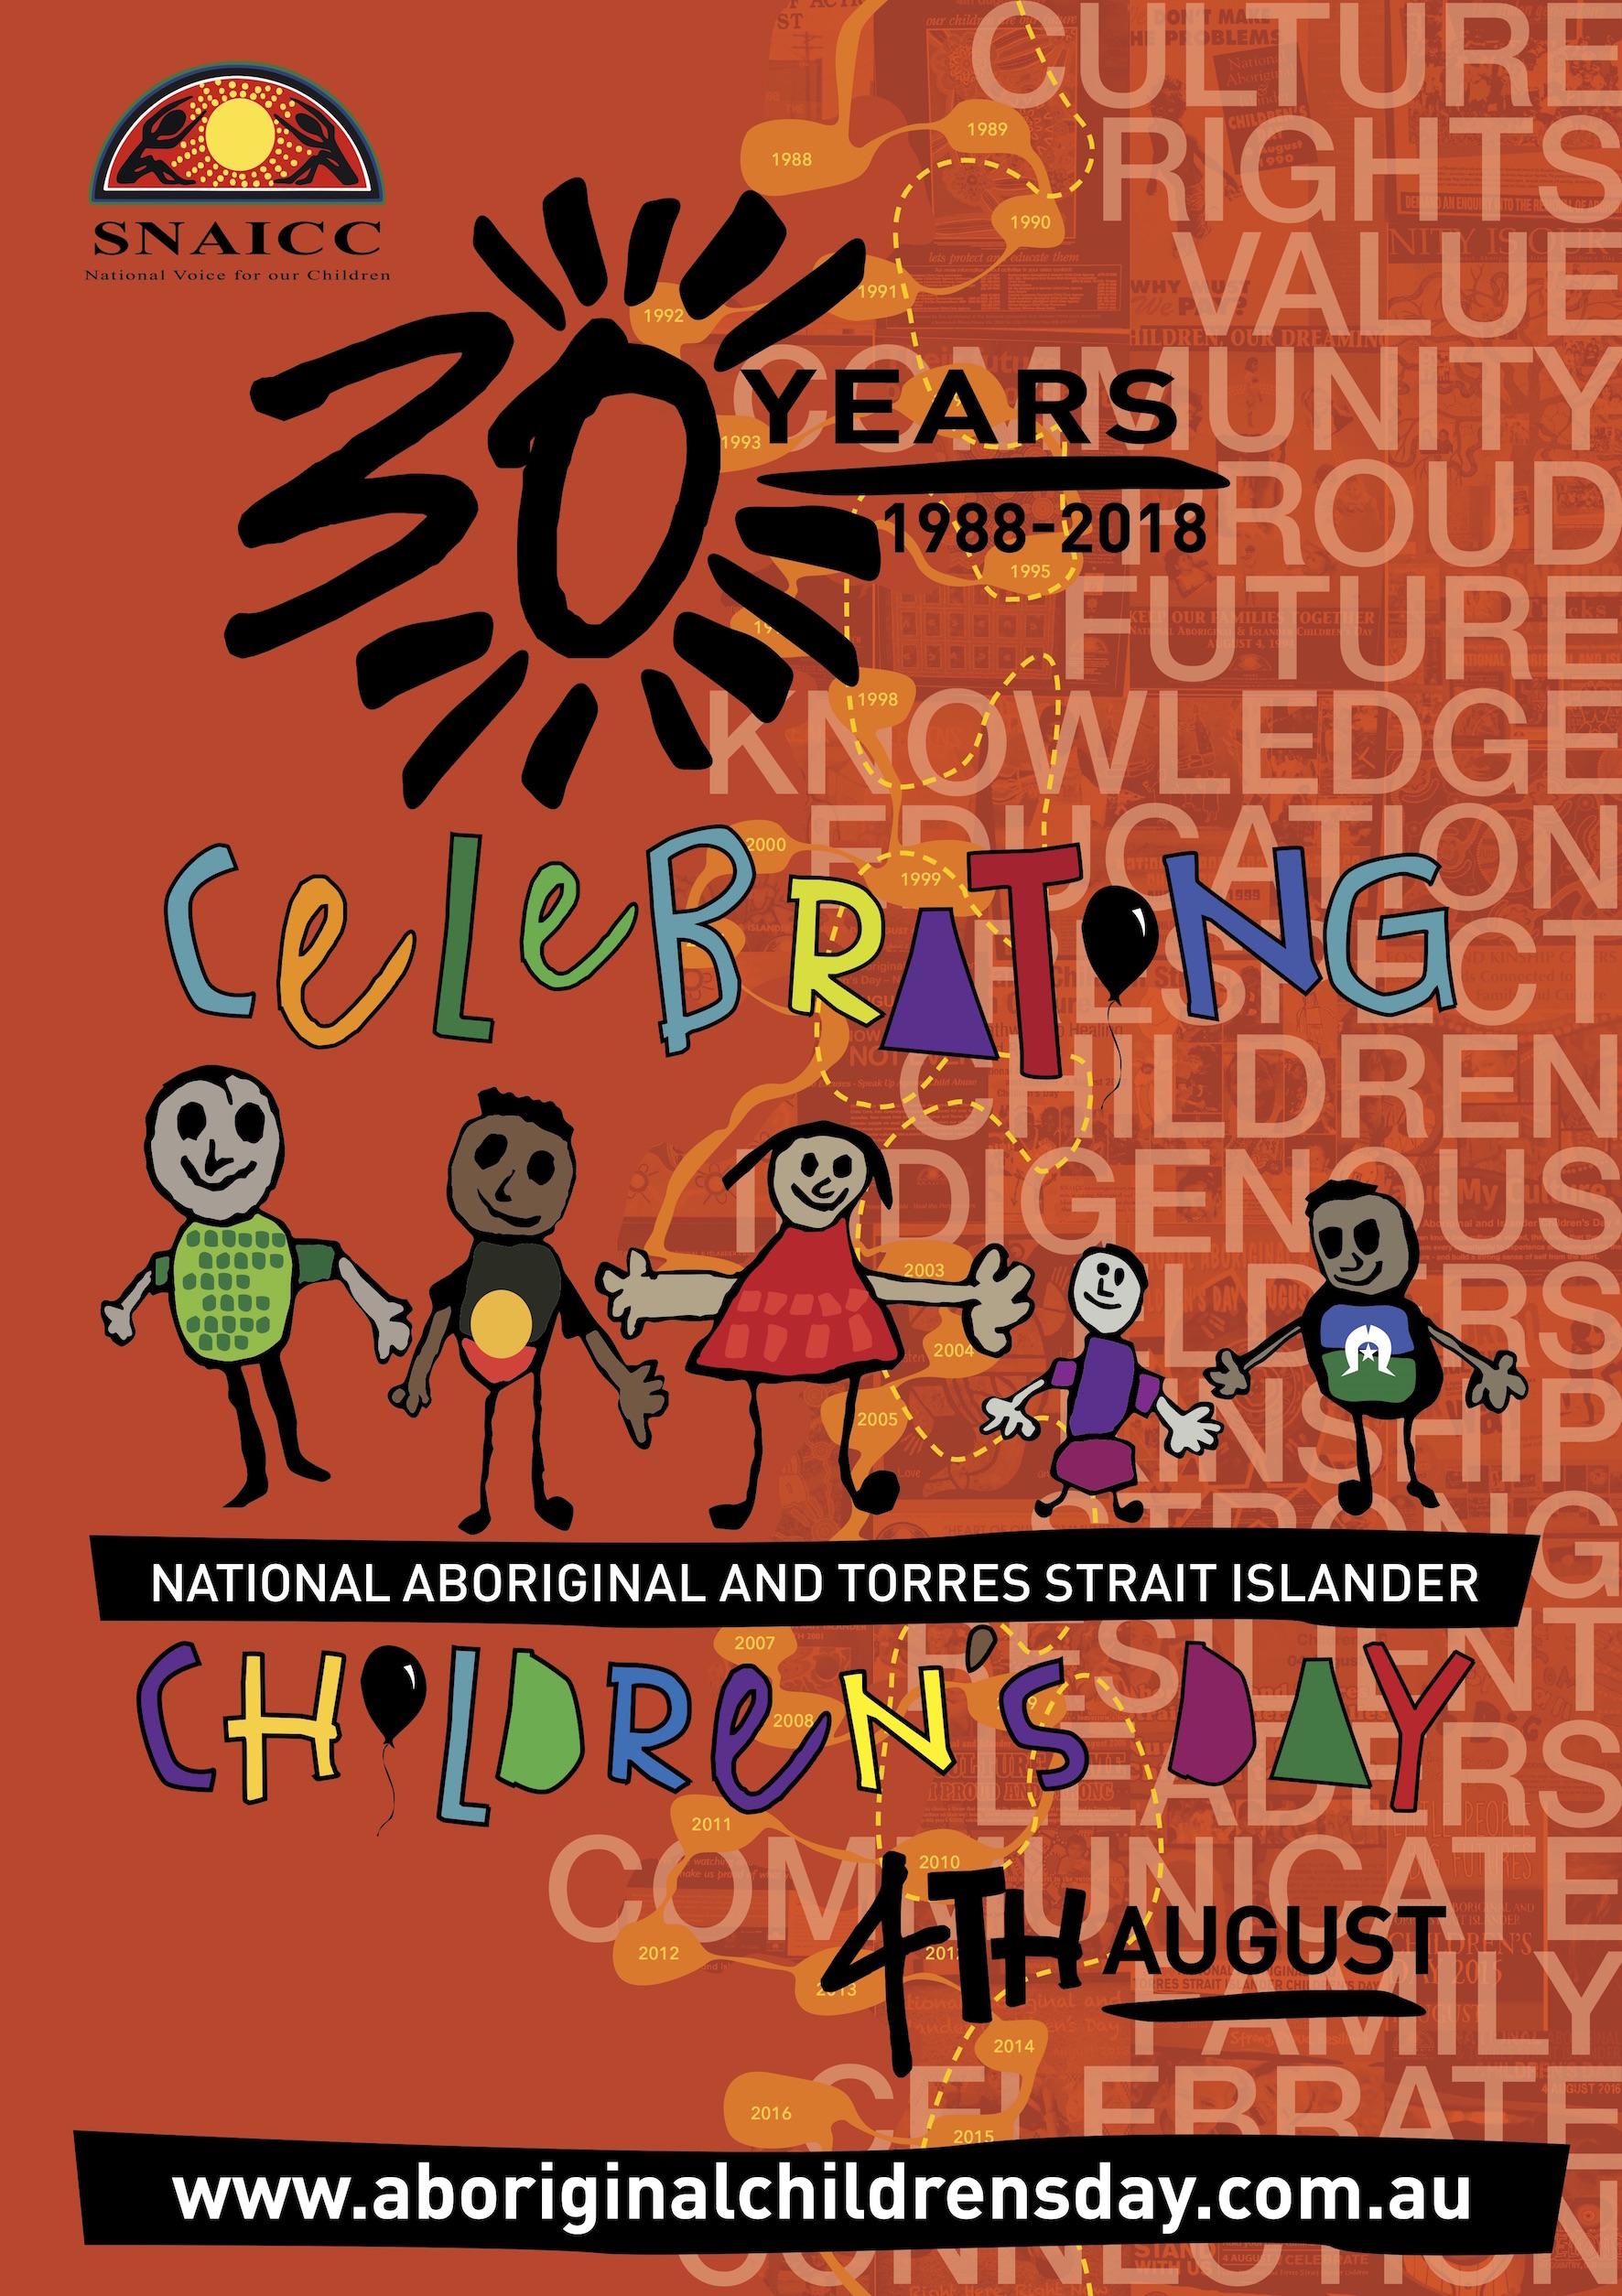 Childrens-Day-Poster-2018.jpg